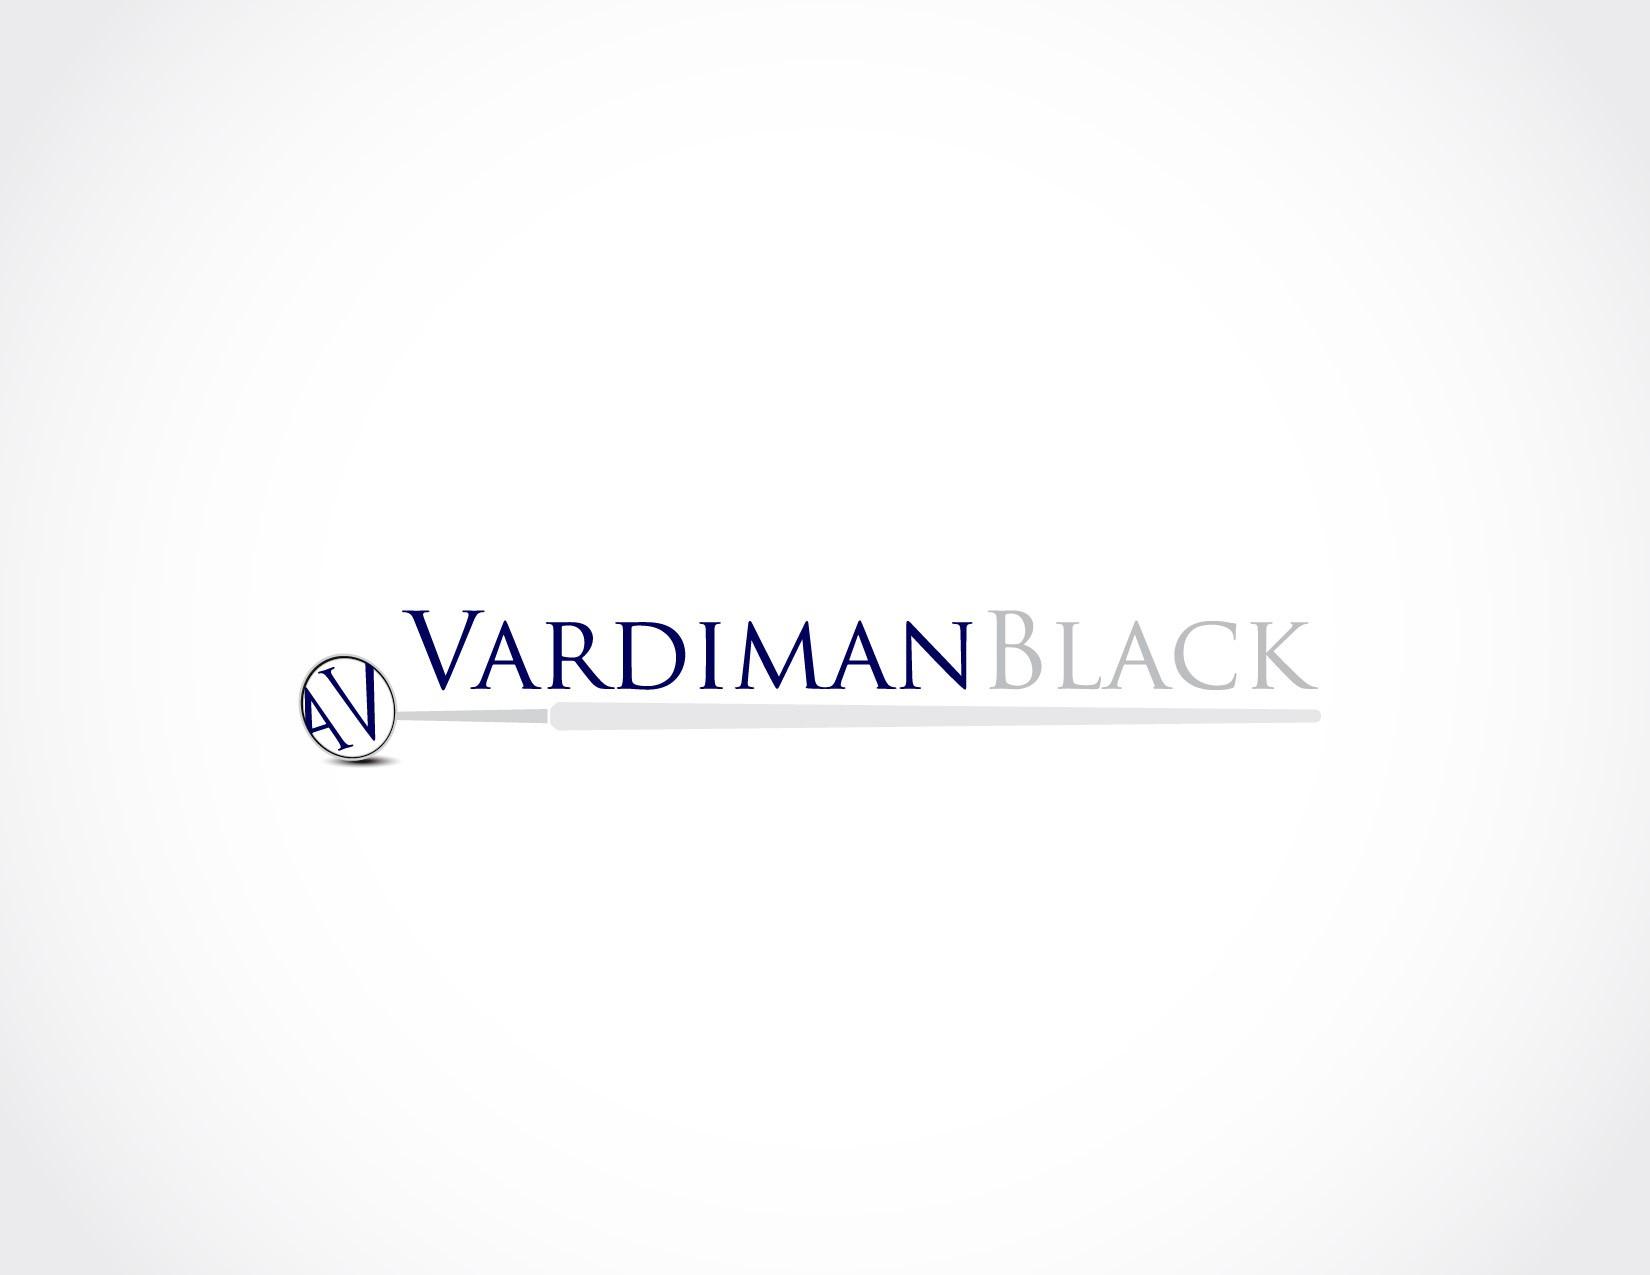 Vardiman Black